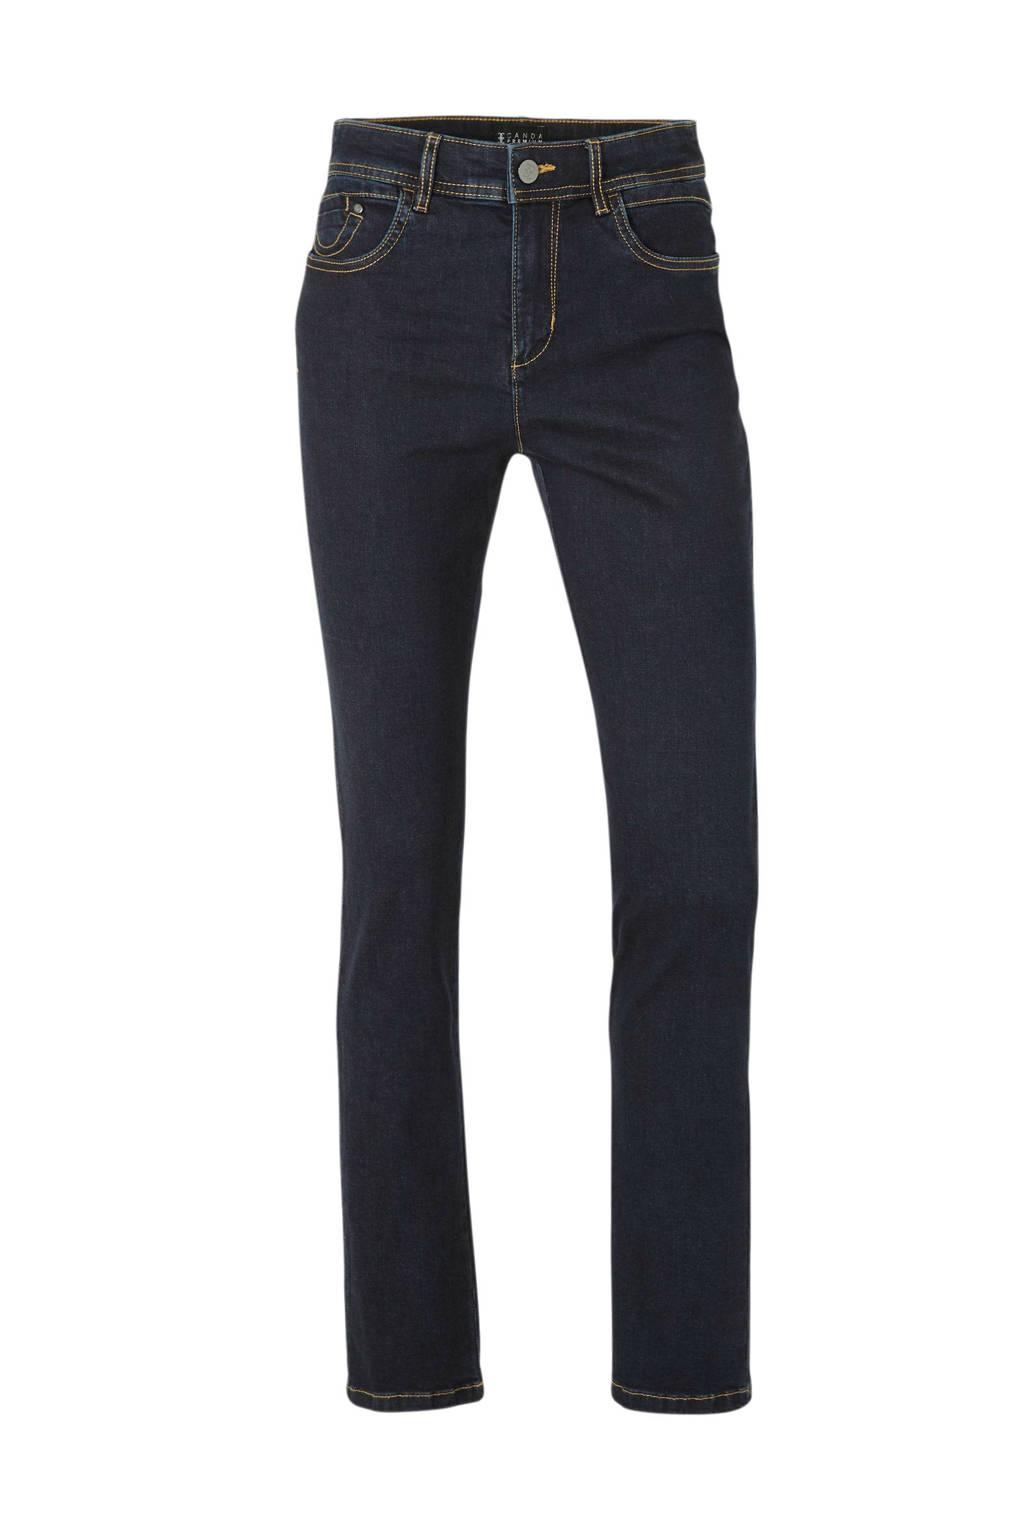 C&A Canda high waist straight fit jeans, Dark denim